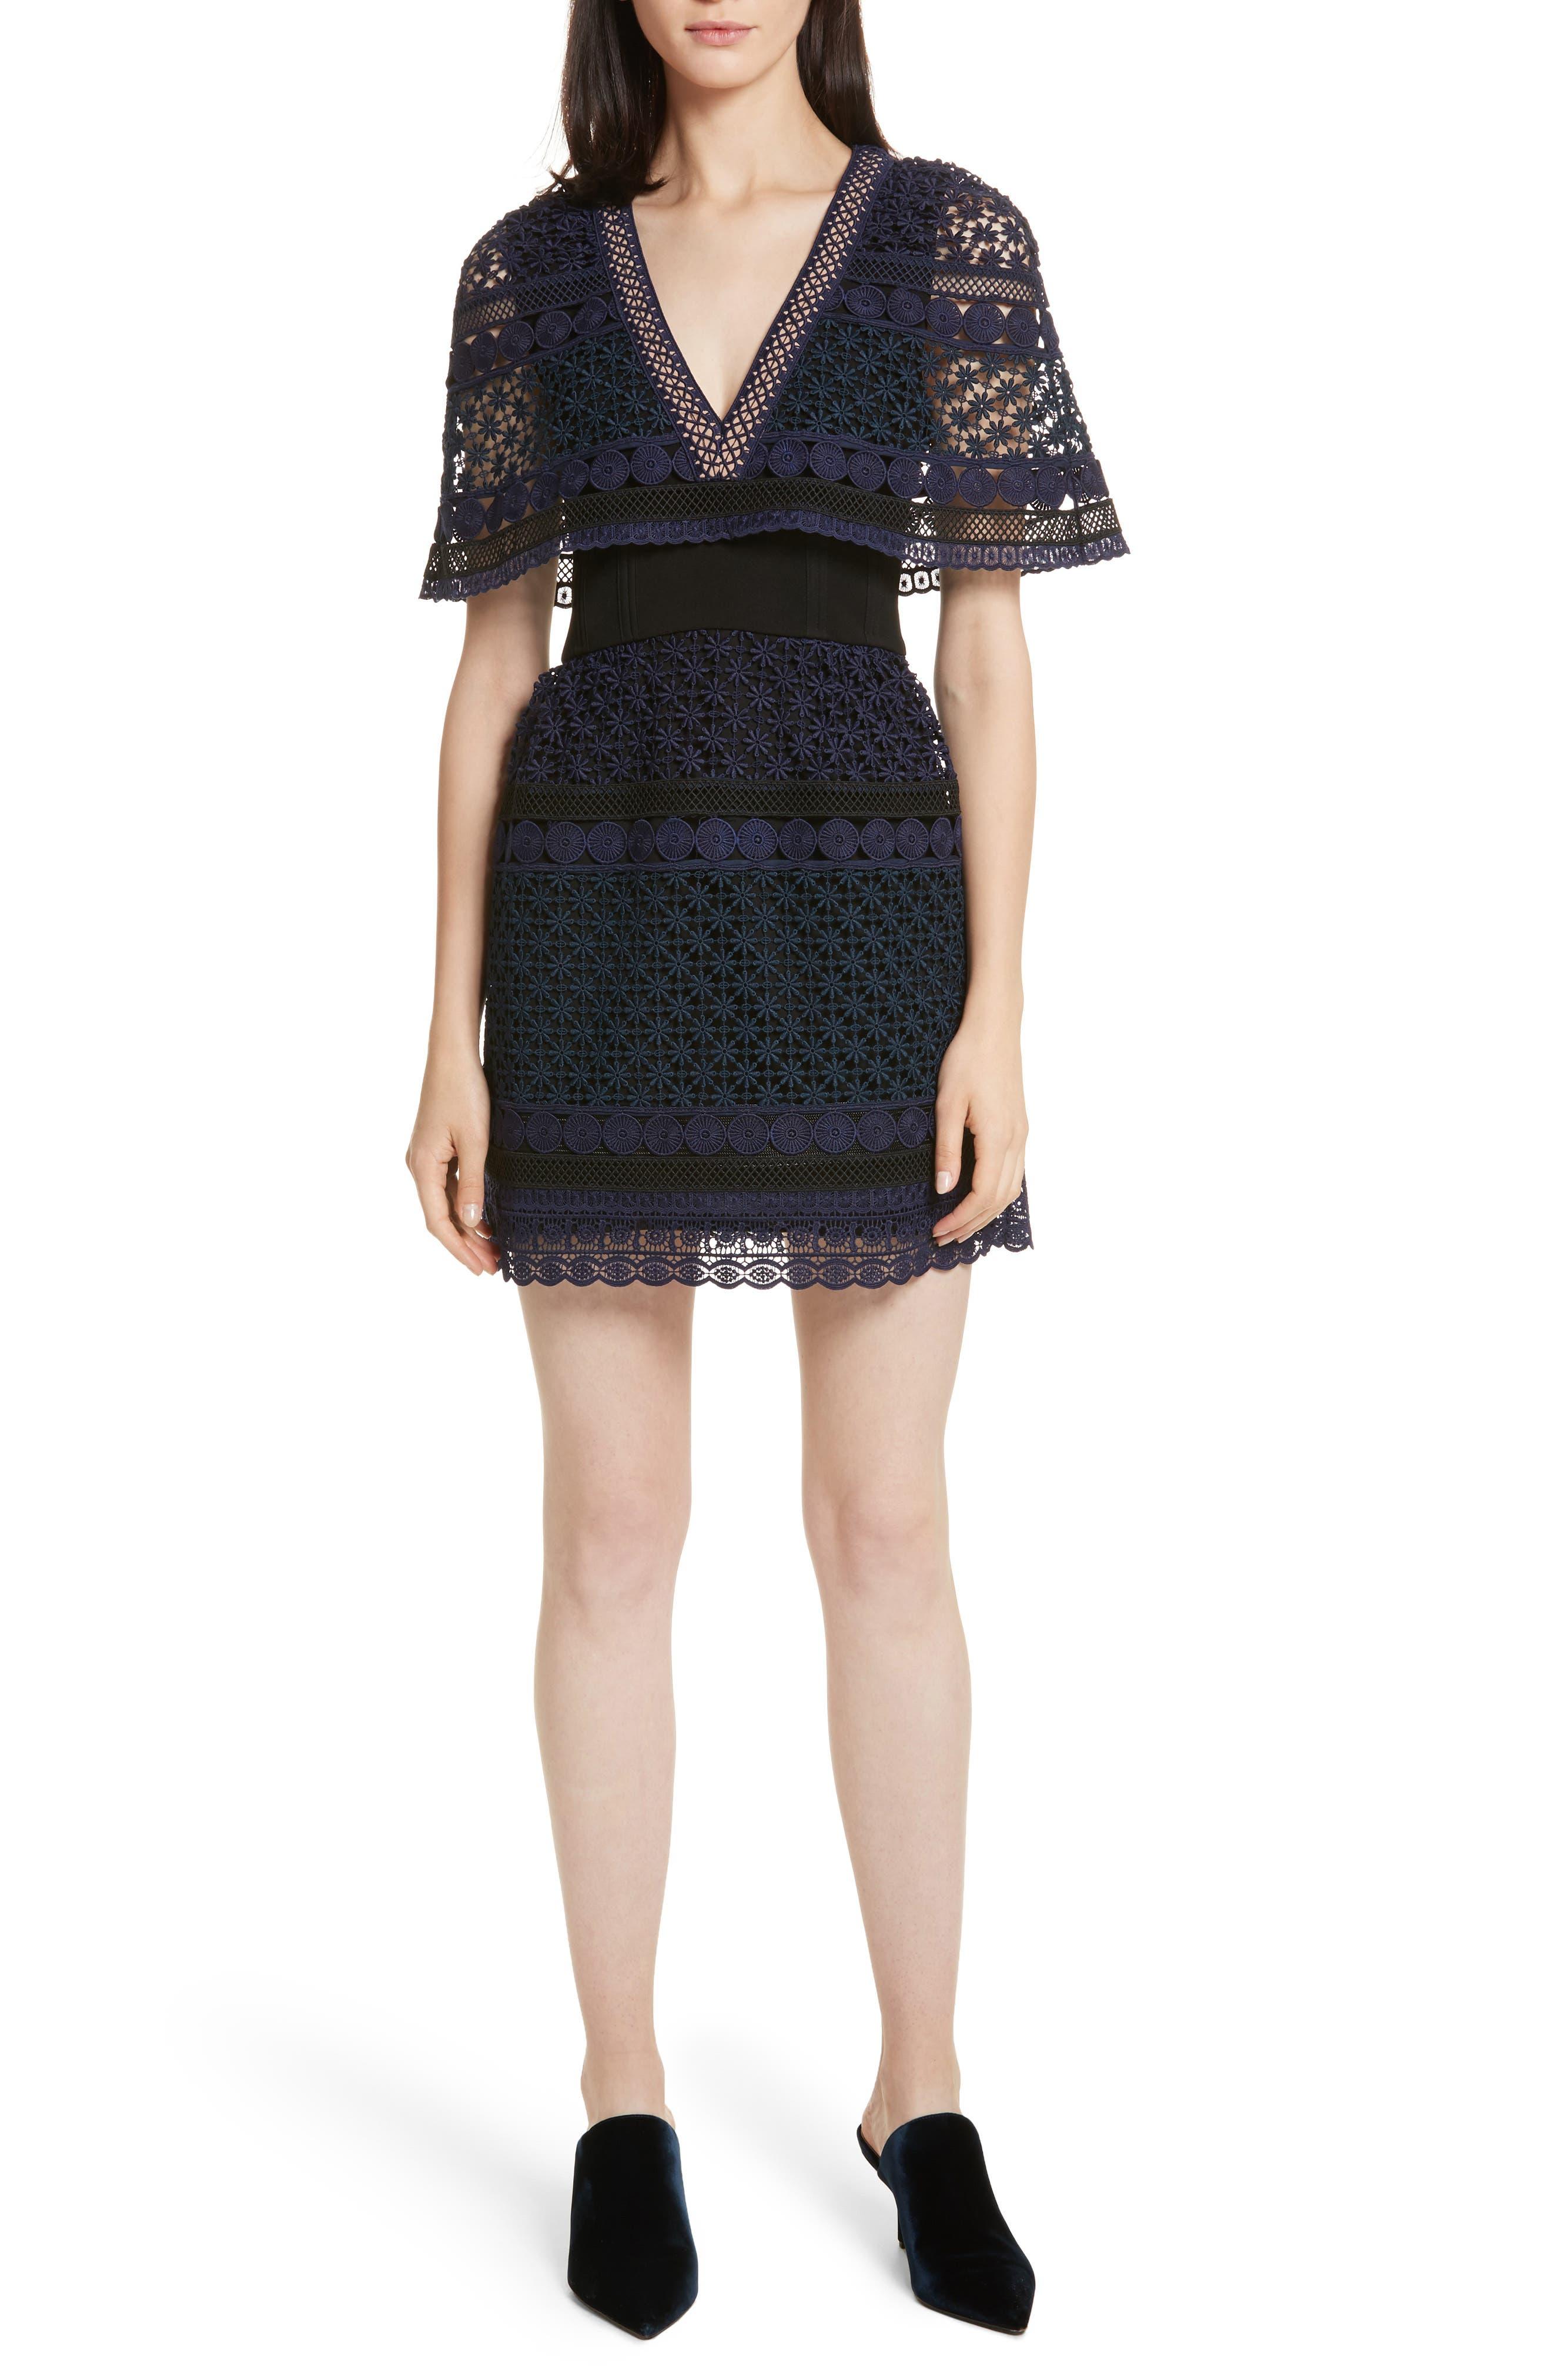 Alternate Image 1 Selected - Self-Portrait Guipure Lace Cape Dress